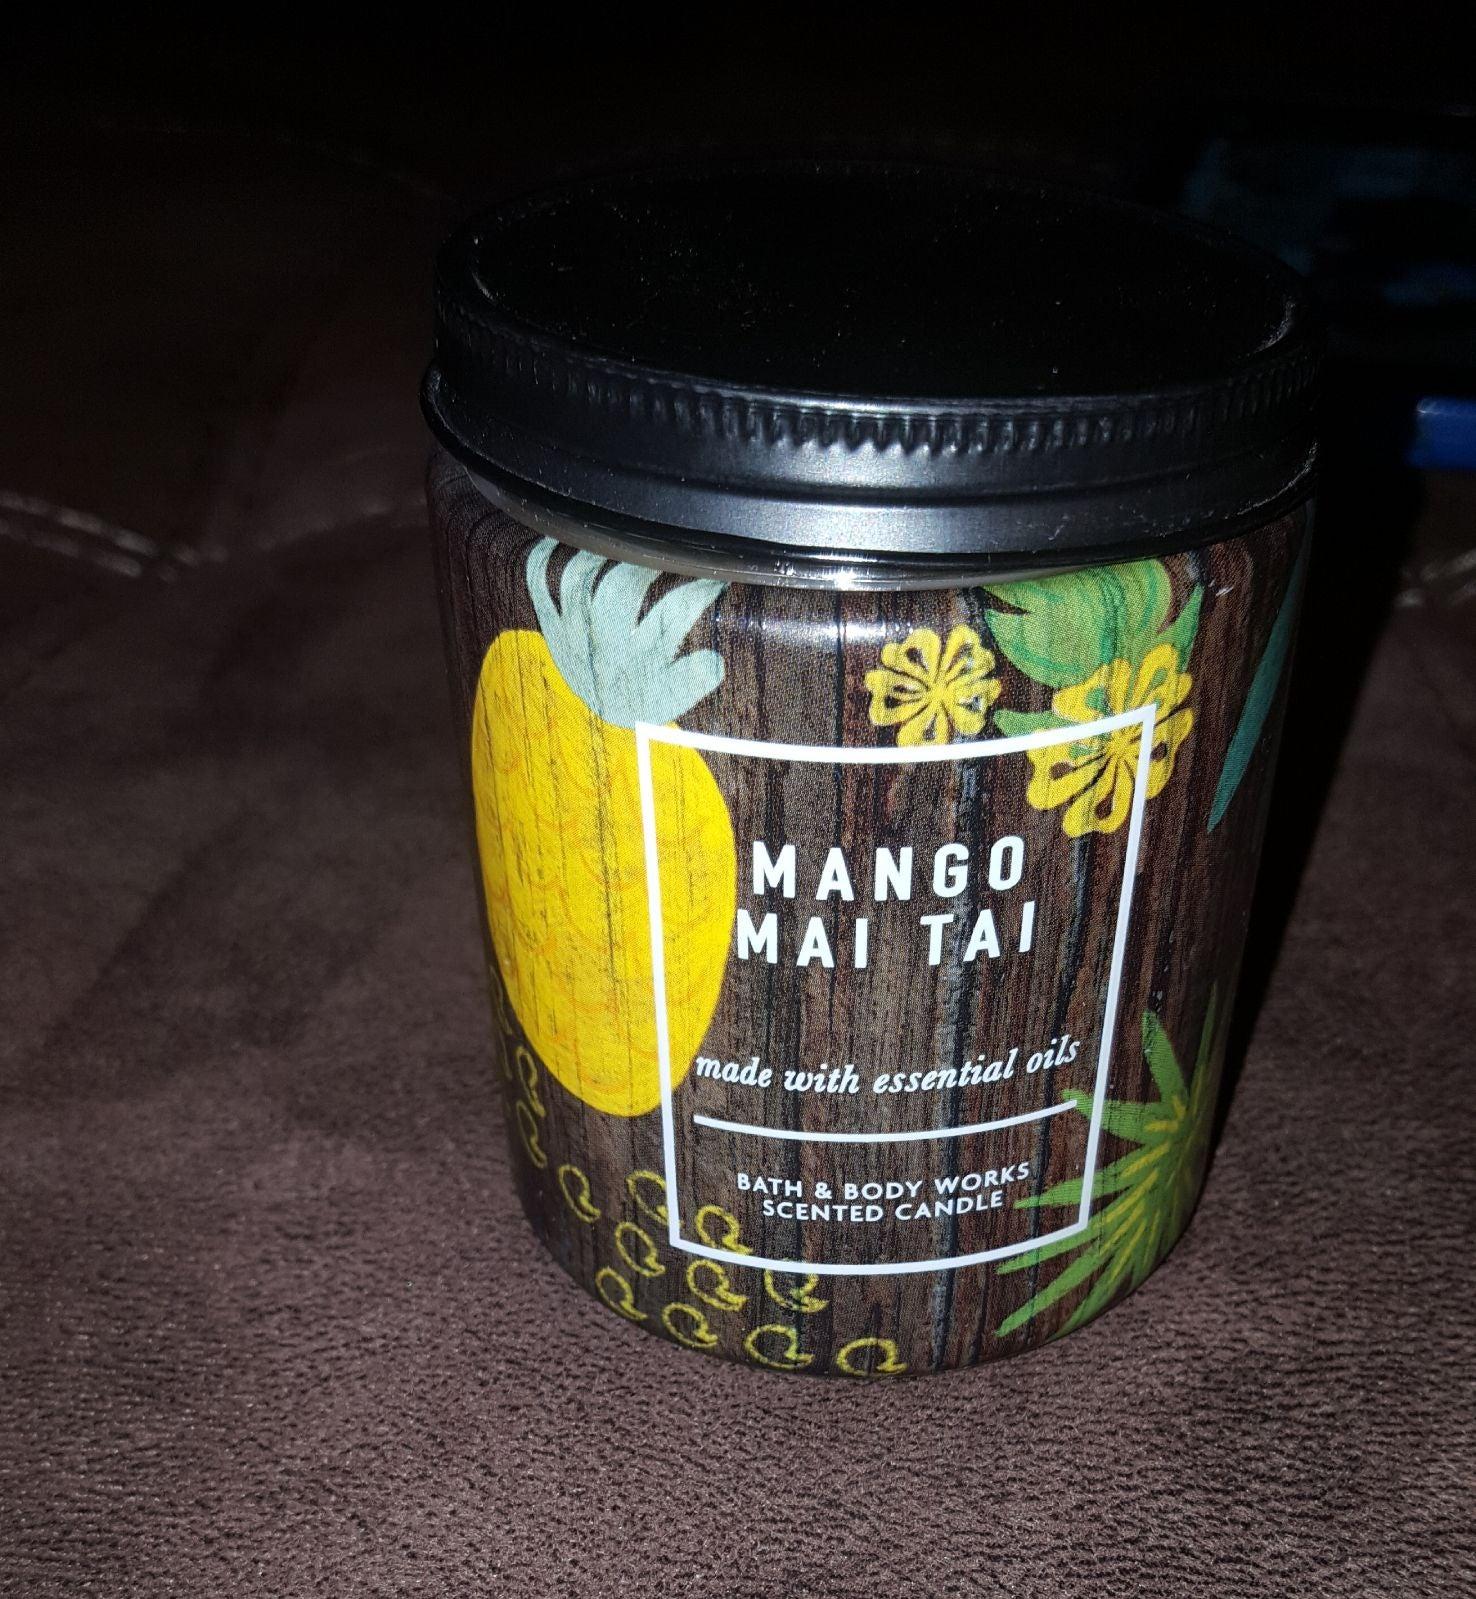 Bbw mango mai tai candle New